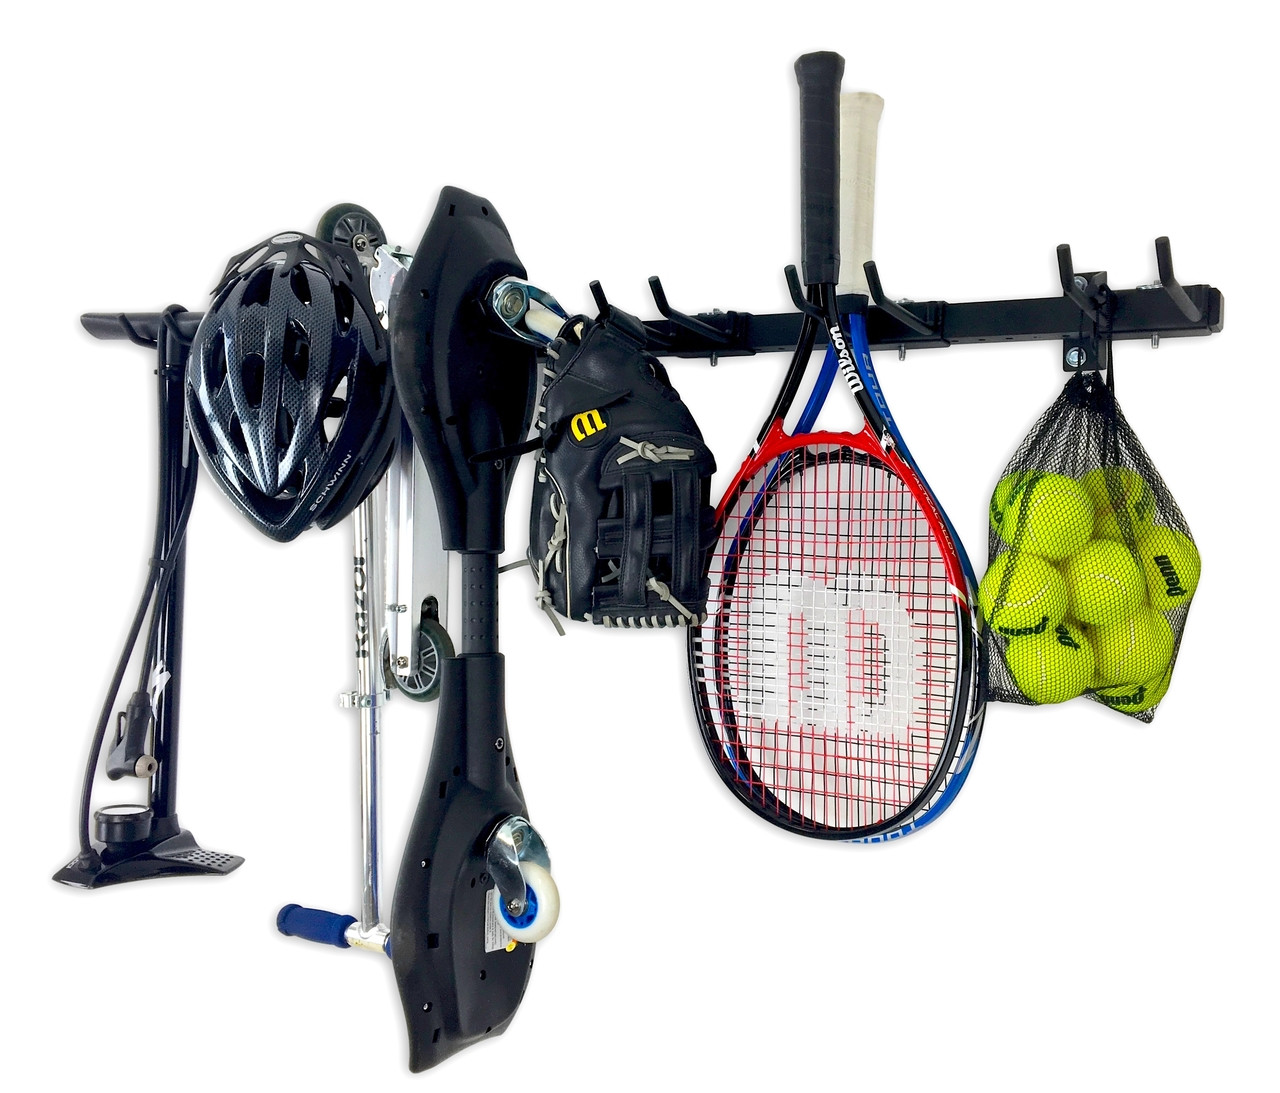 Omni Sports Equipment Rack | Compact | Wall Mounted Home U0026 Garage Storage  System